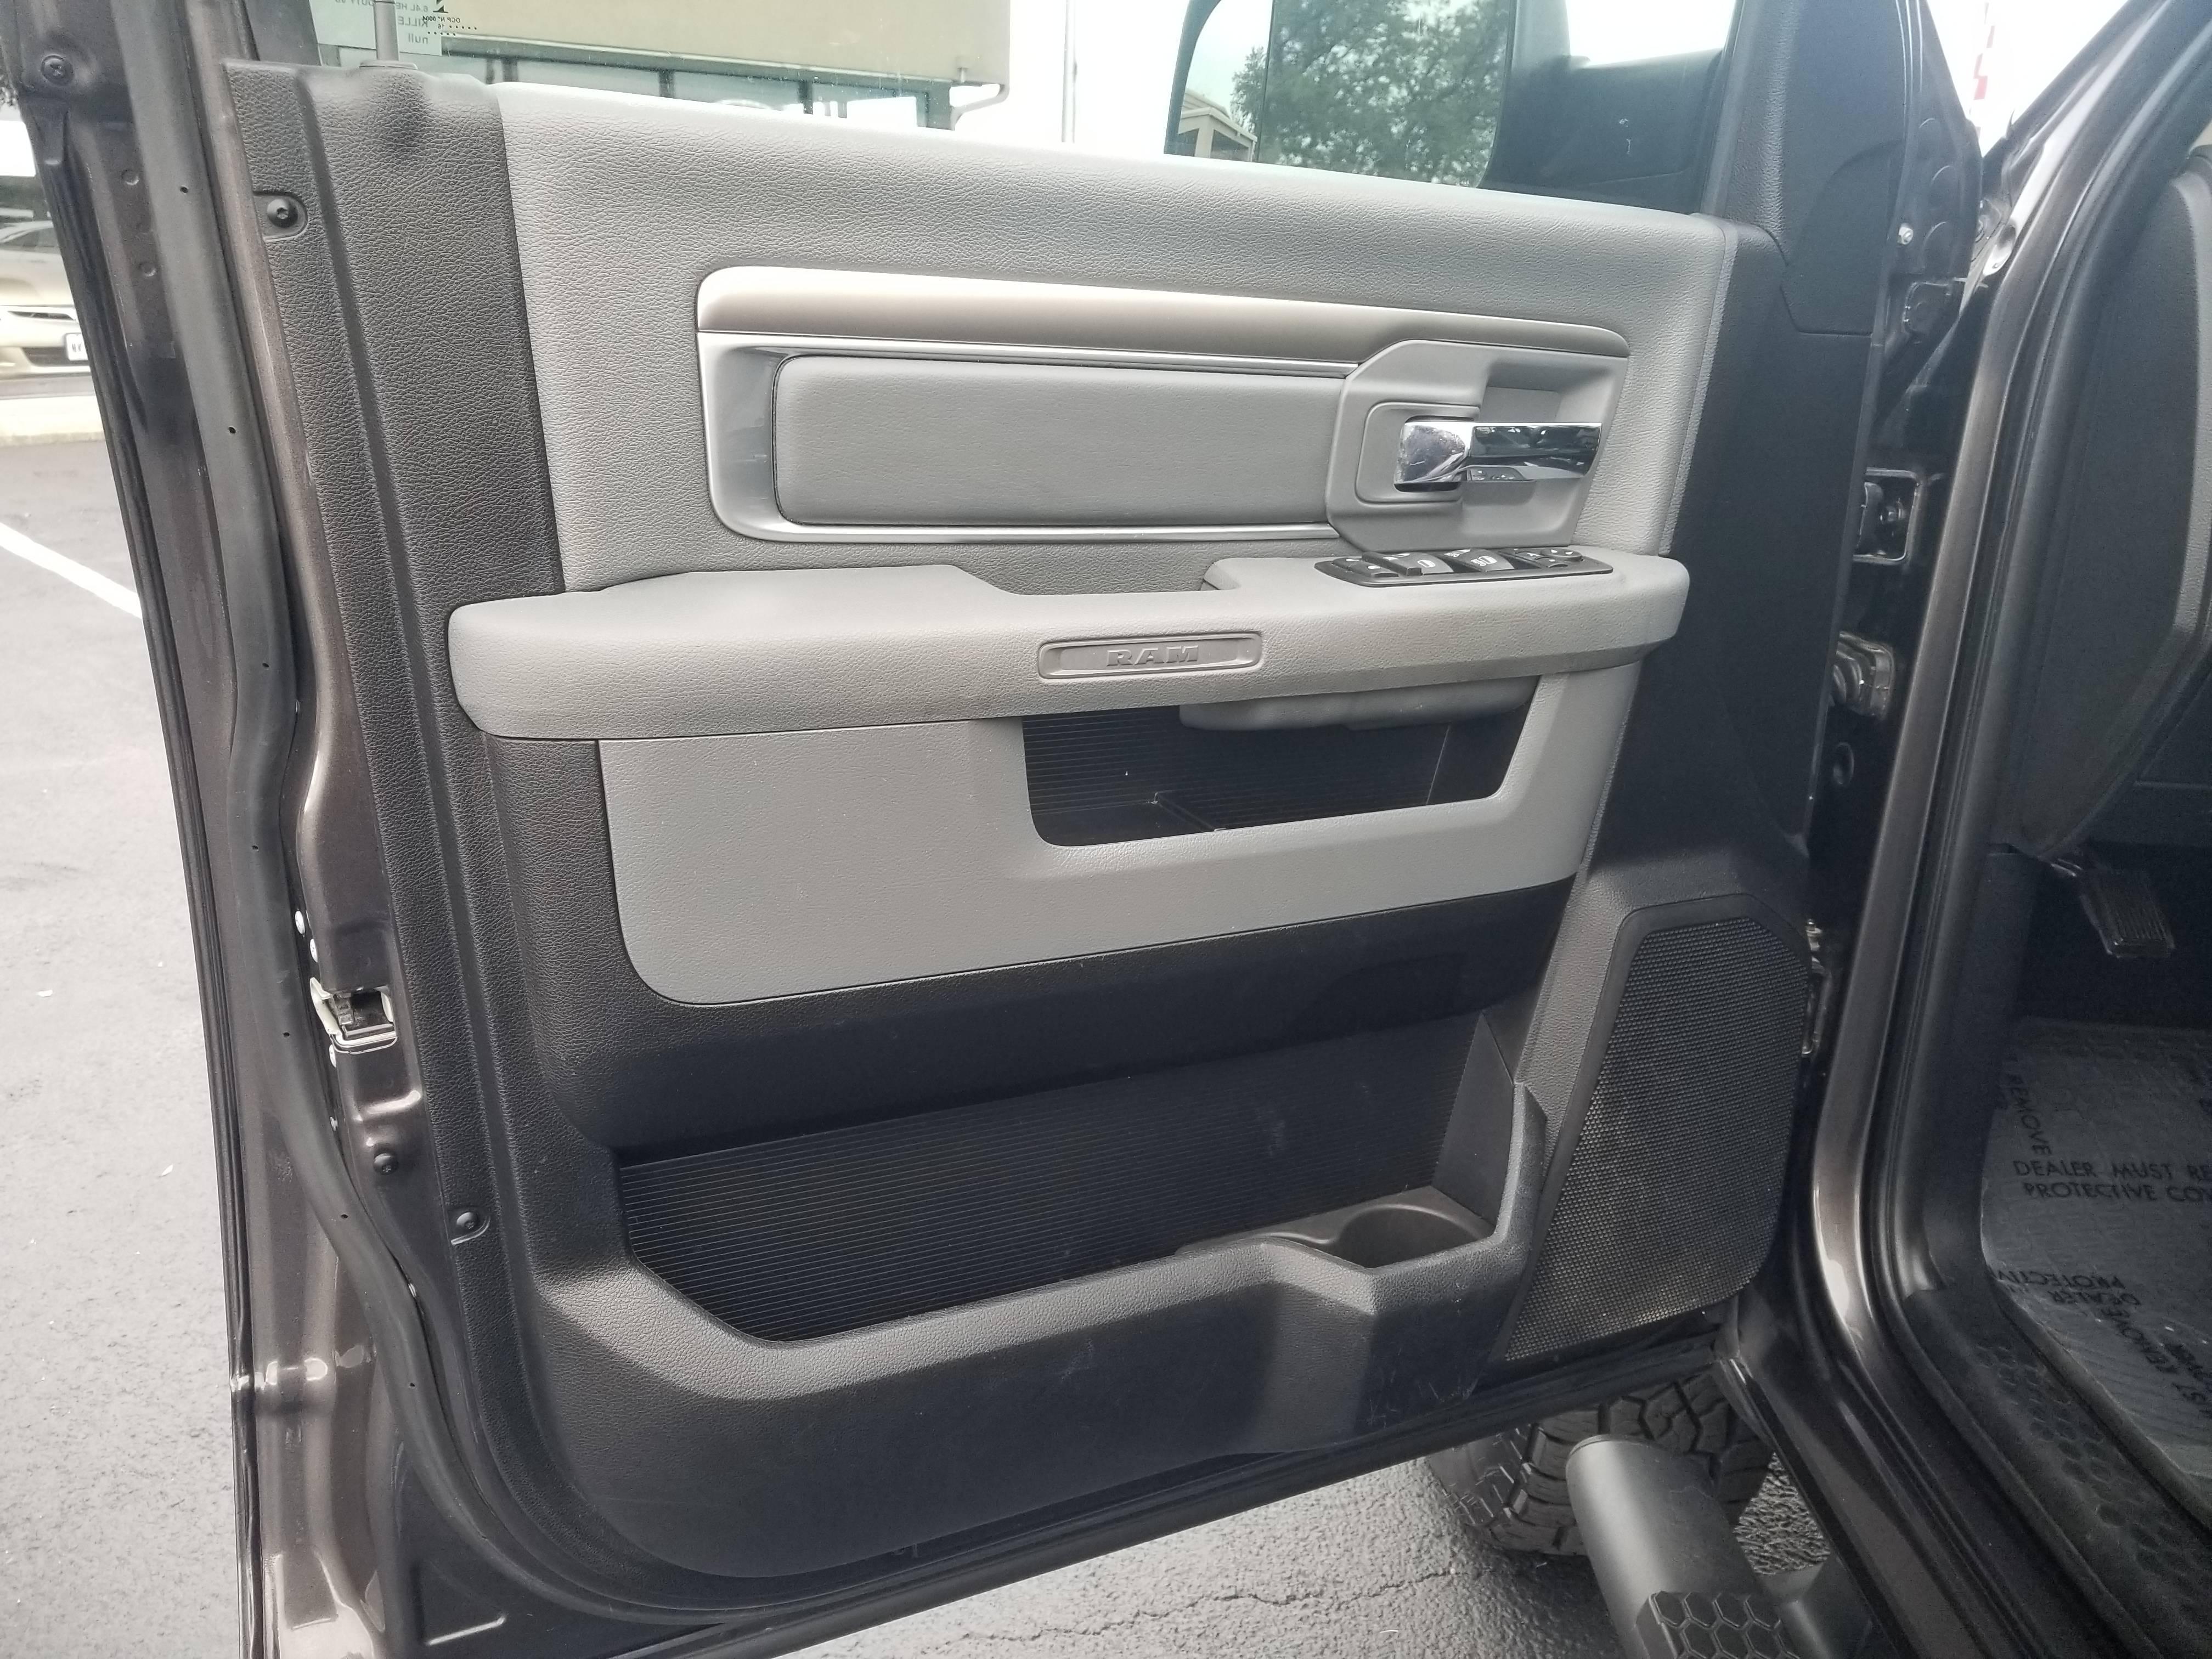 used vehicle - Truck RAM 2500 2016